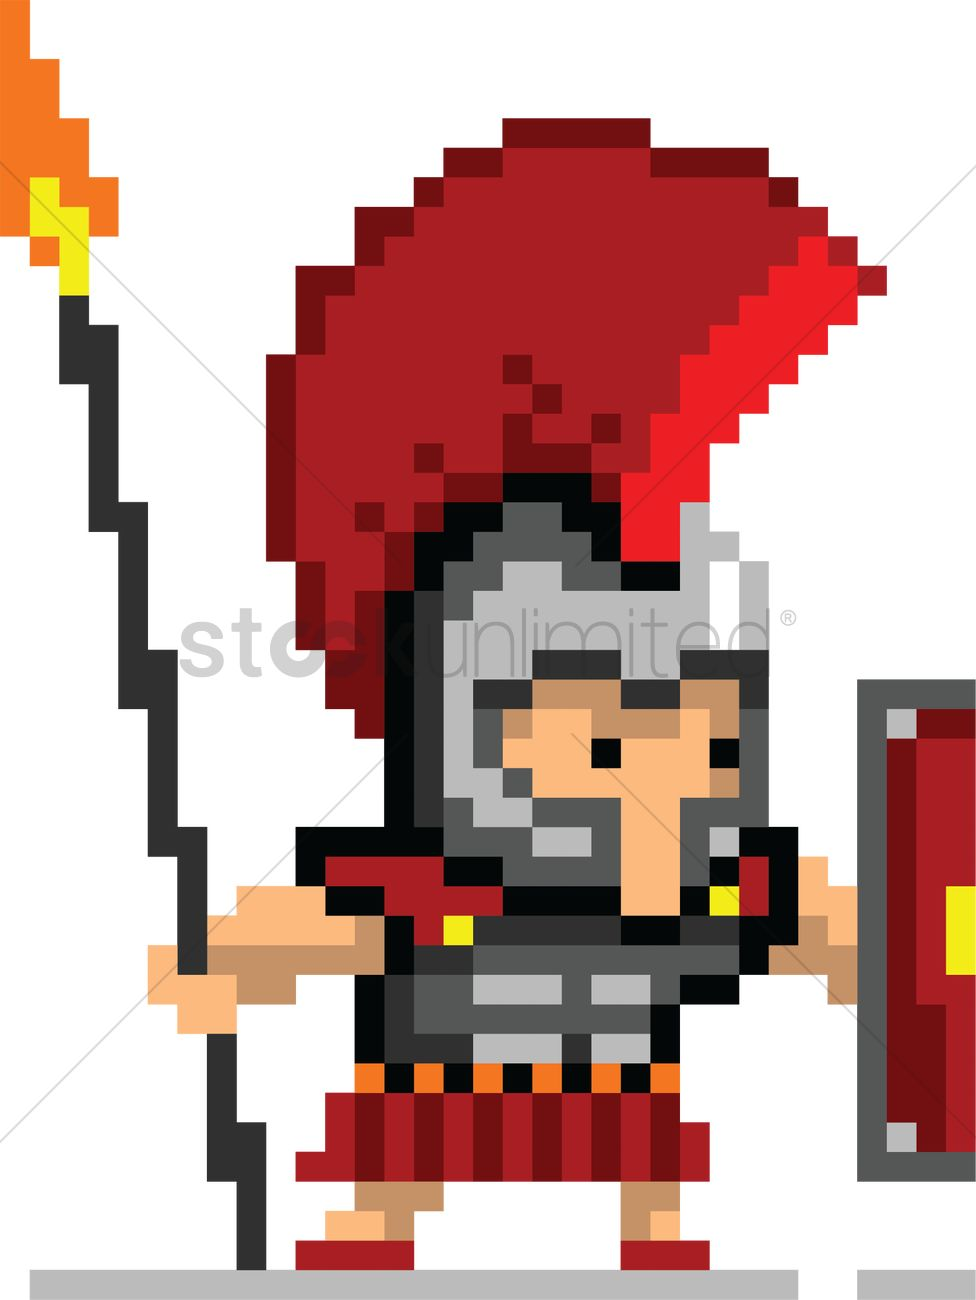 Pixel Art Gaming Character Vector Image 2022330